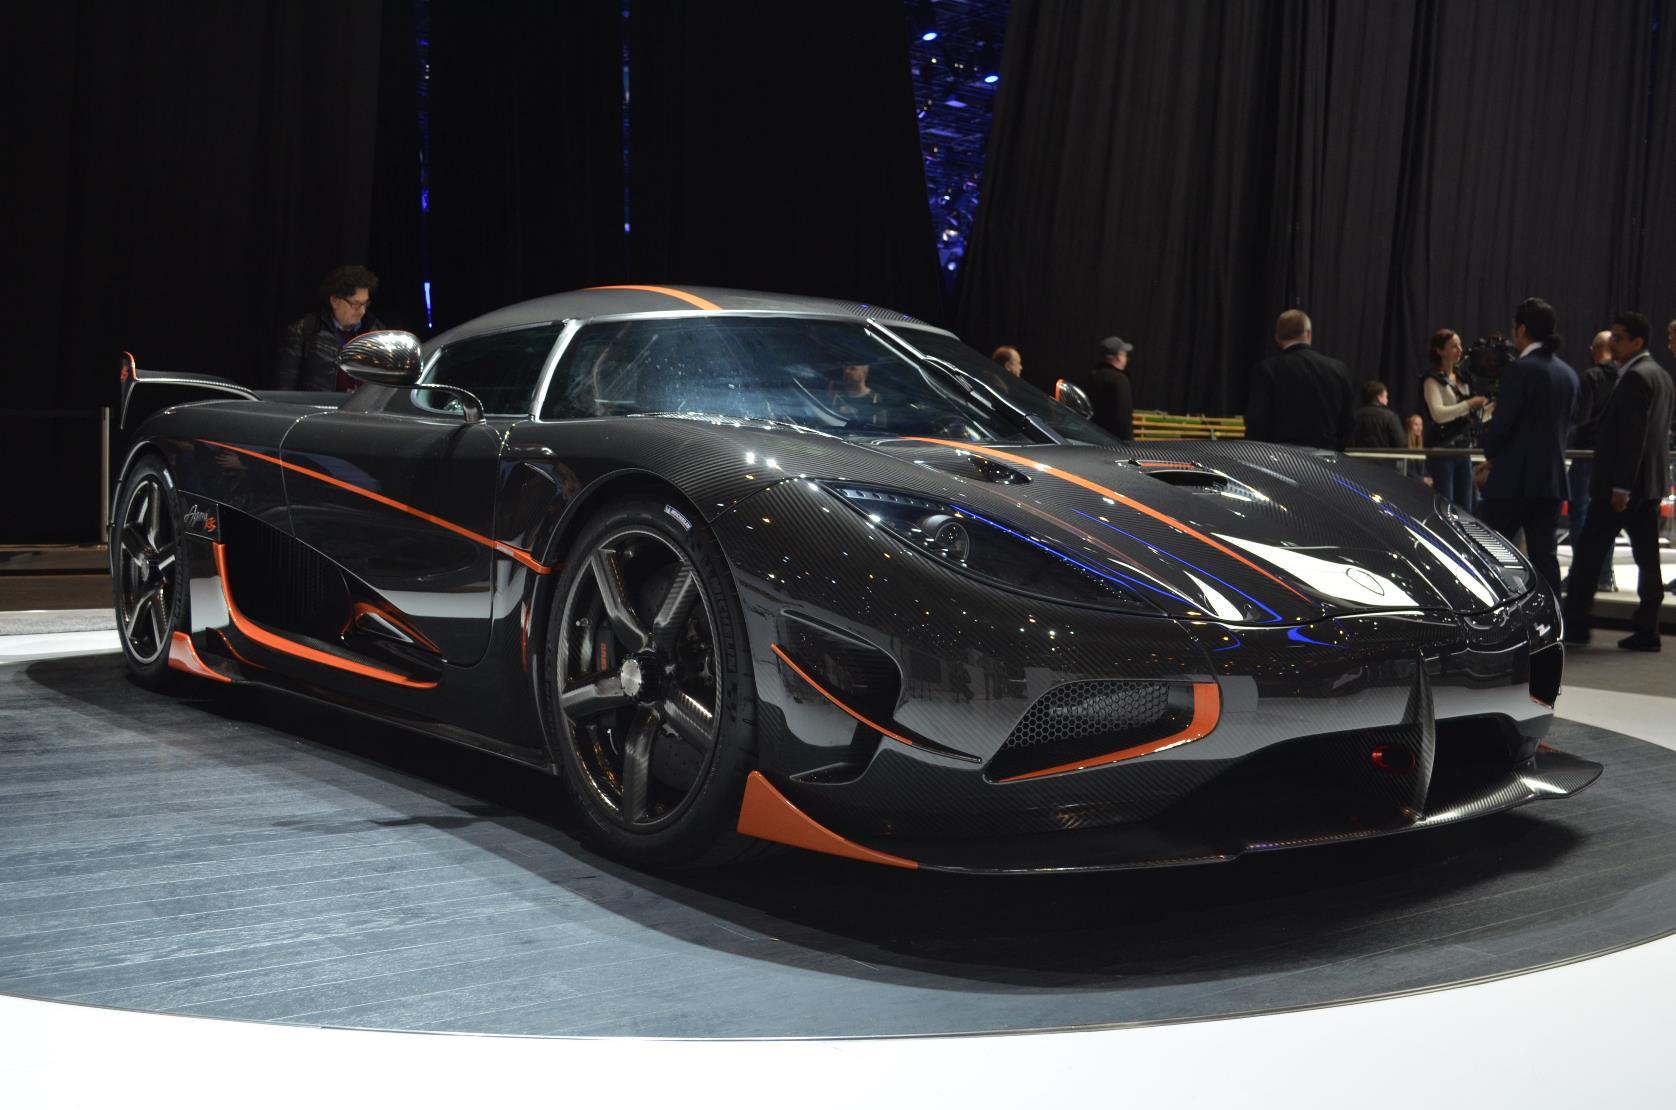 This $1 Million Hybrid Supercar is a Bargain